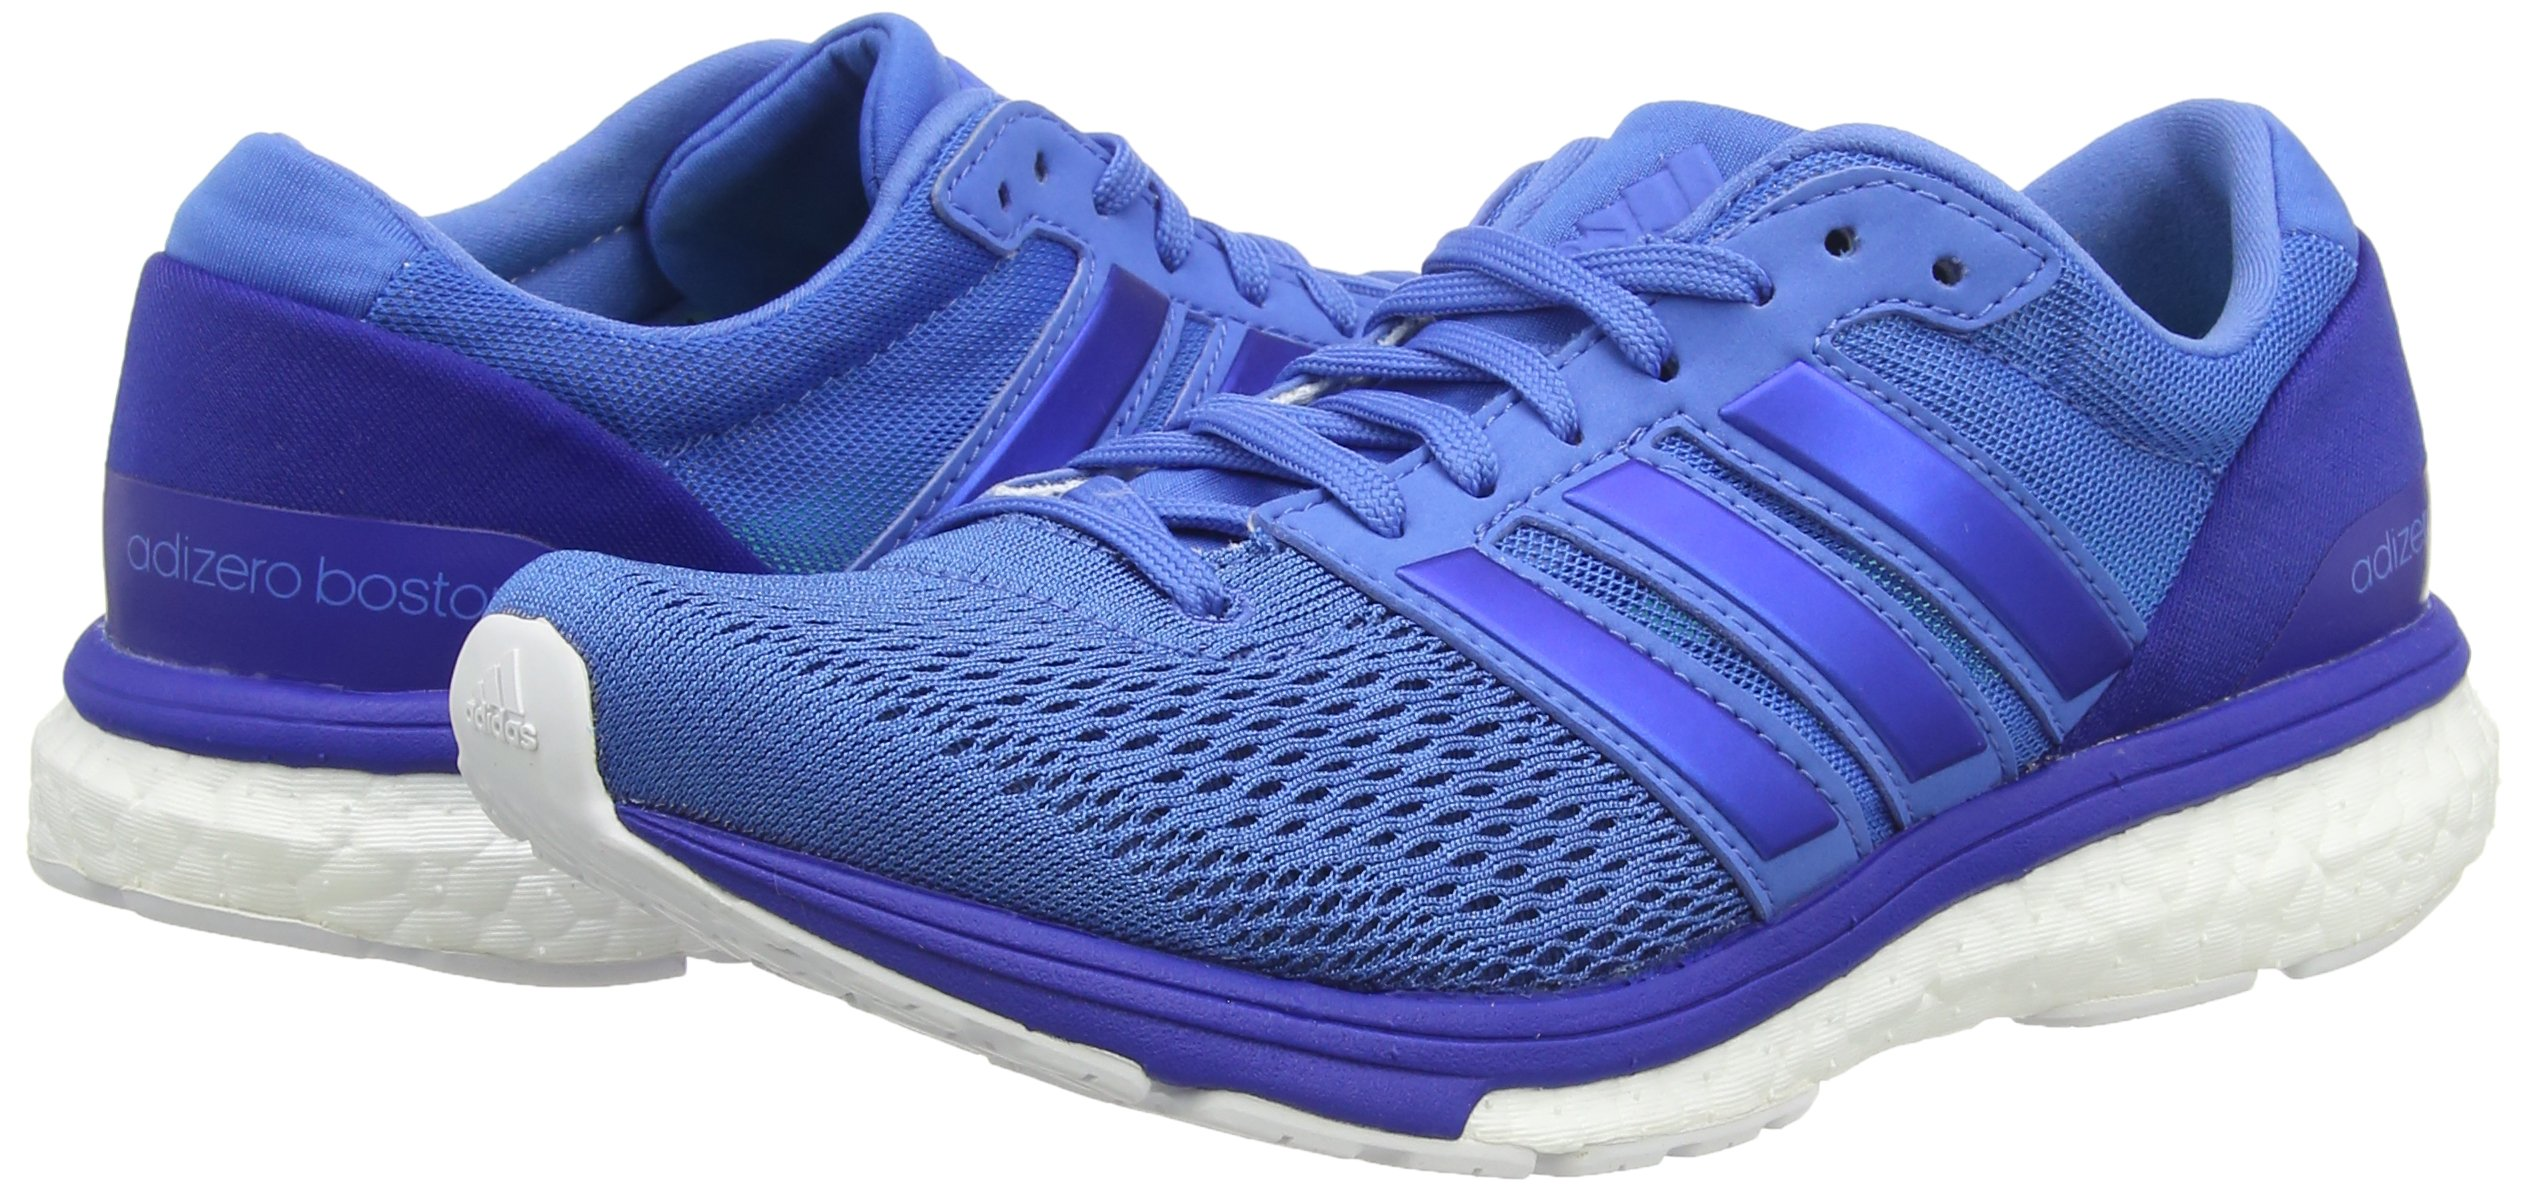 81ZKKyms4ZL - adidas Women's Adizero Boston 6 Competition Running Shoes